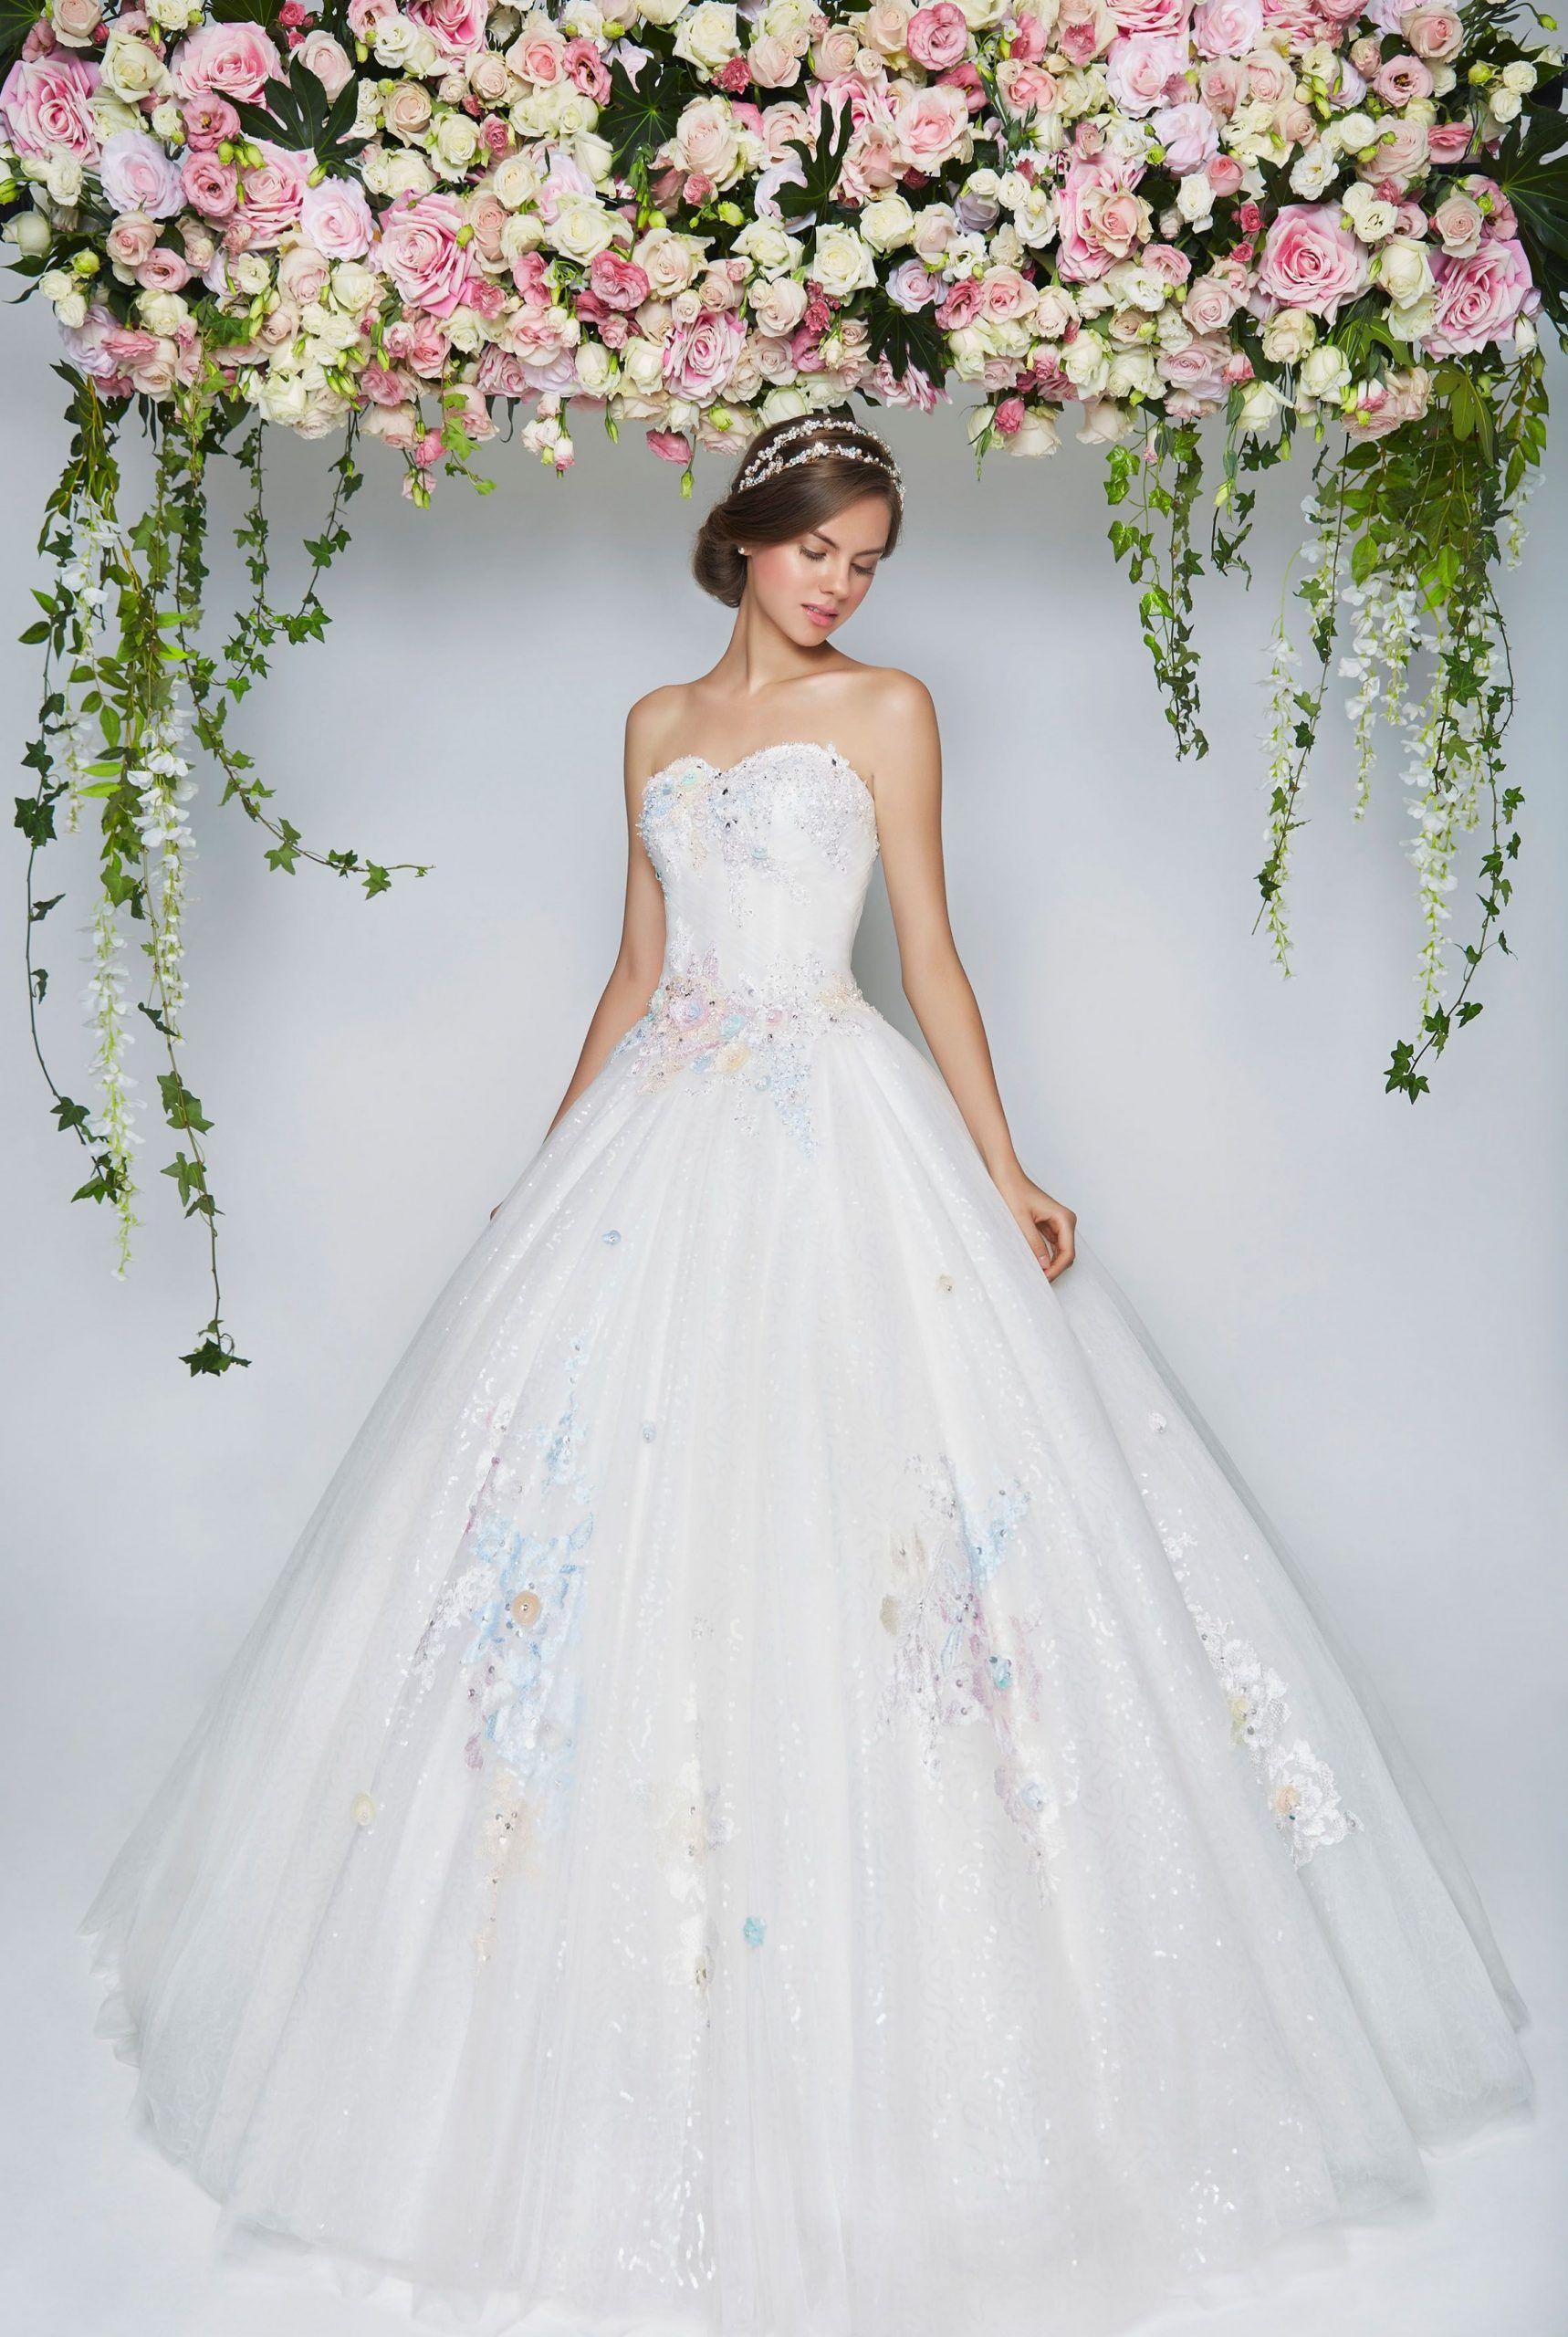 Short Wedding Dress Rental Singapore   Rental wedding dresses ...